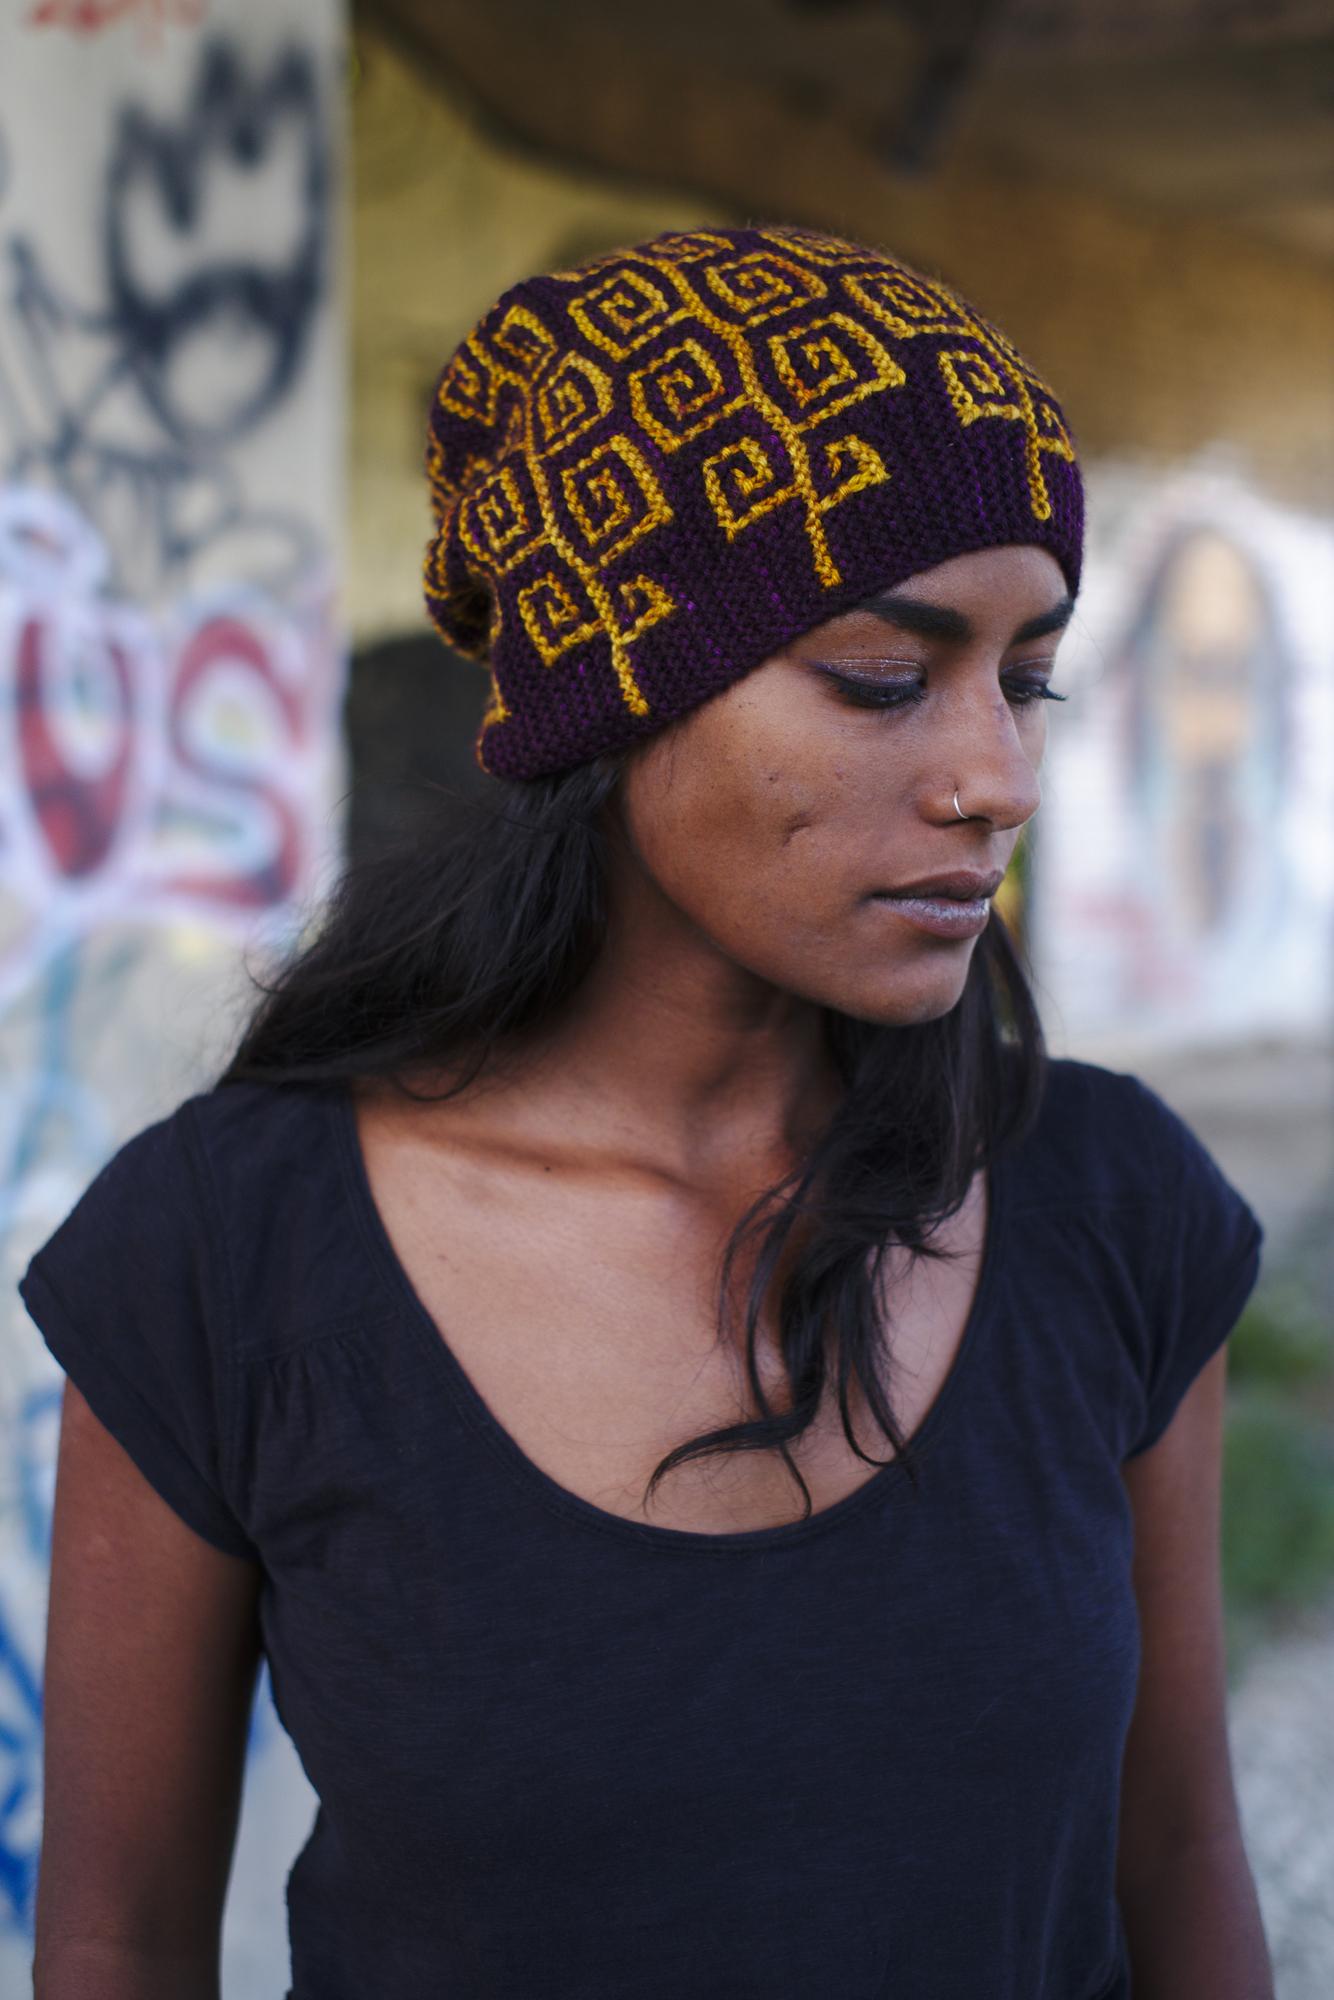 Uprising sideways knit mosaic hat knitting pattern for dk weight yarn